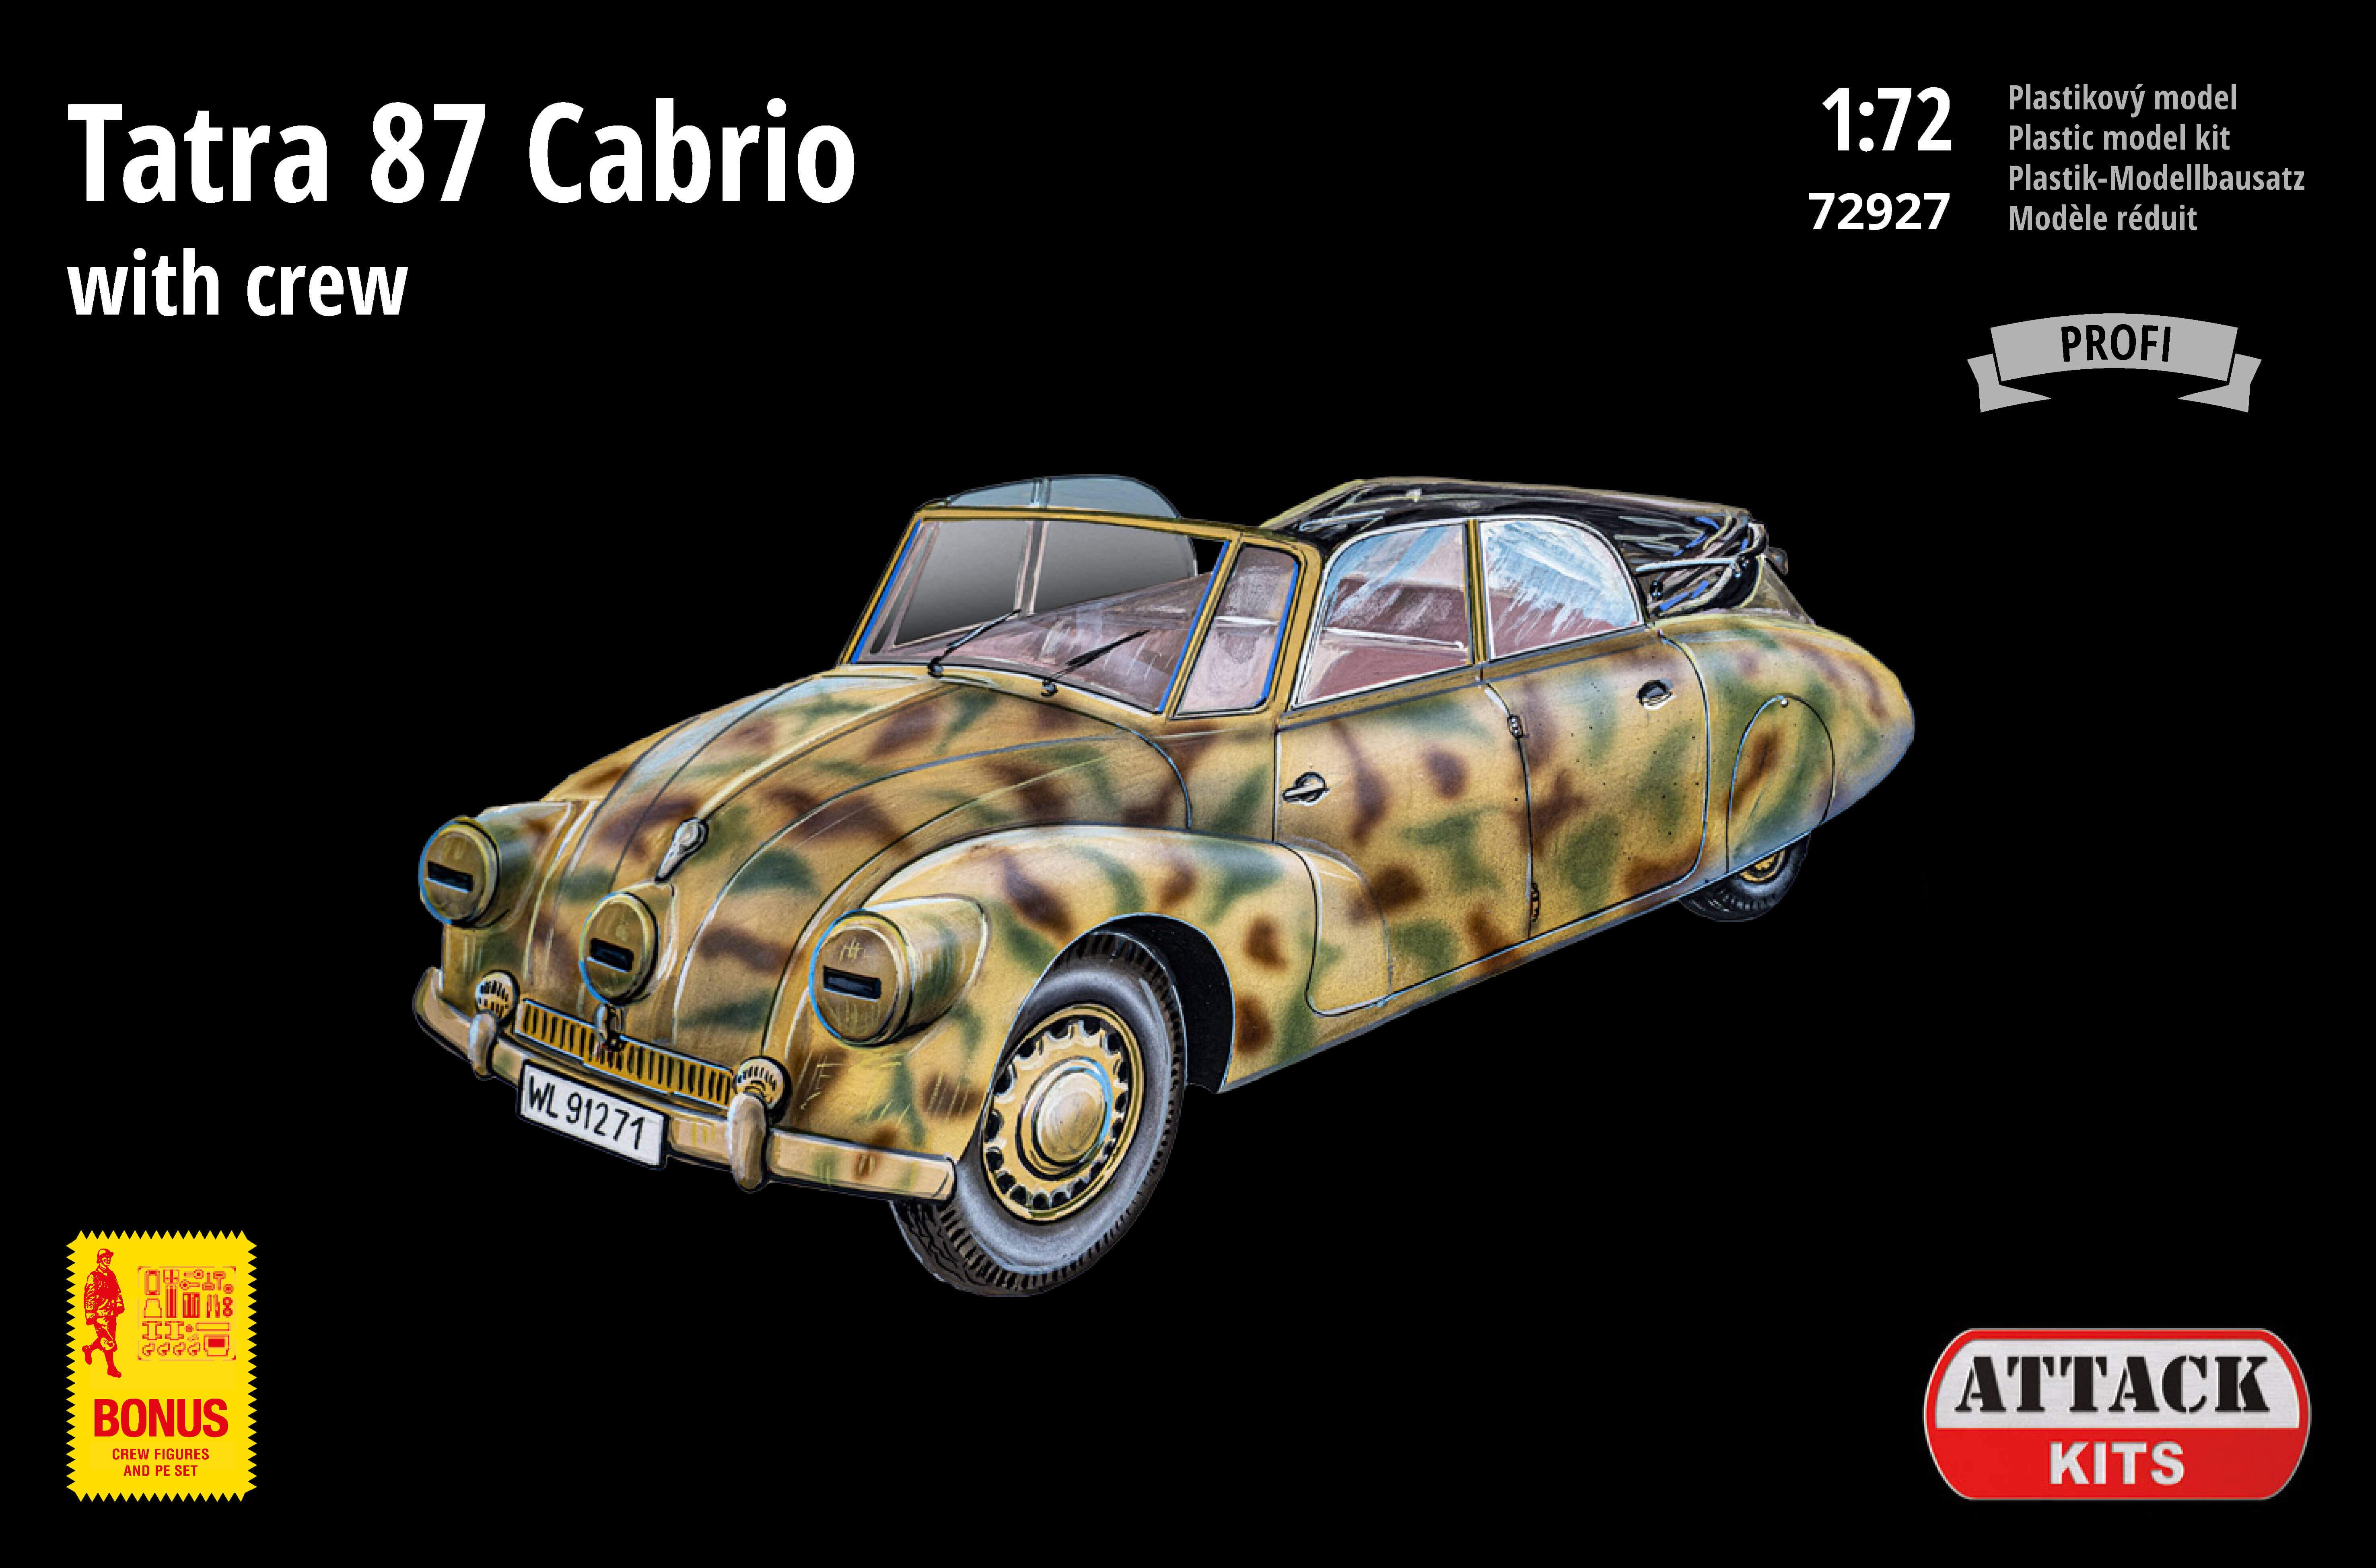 Attack Kits - 72927 - Tatra 87 Cabrio with crew 1:72